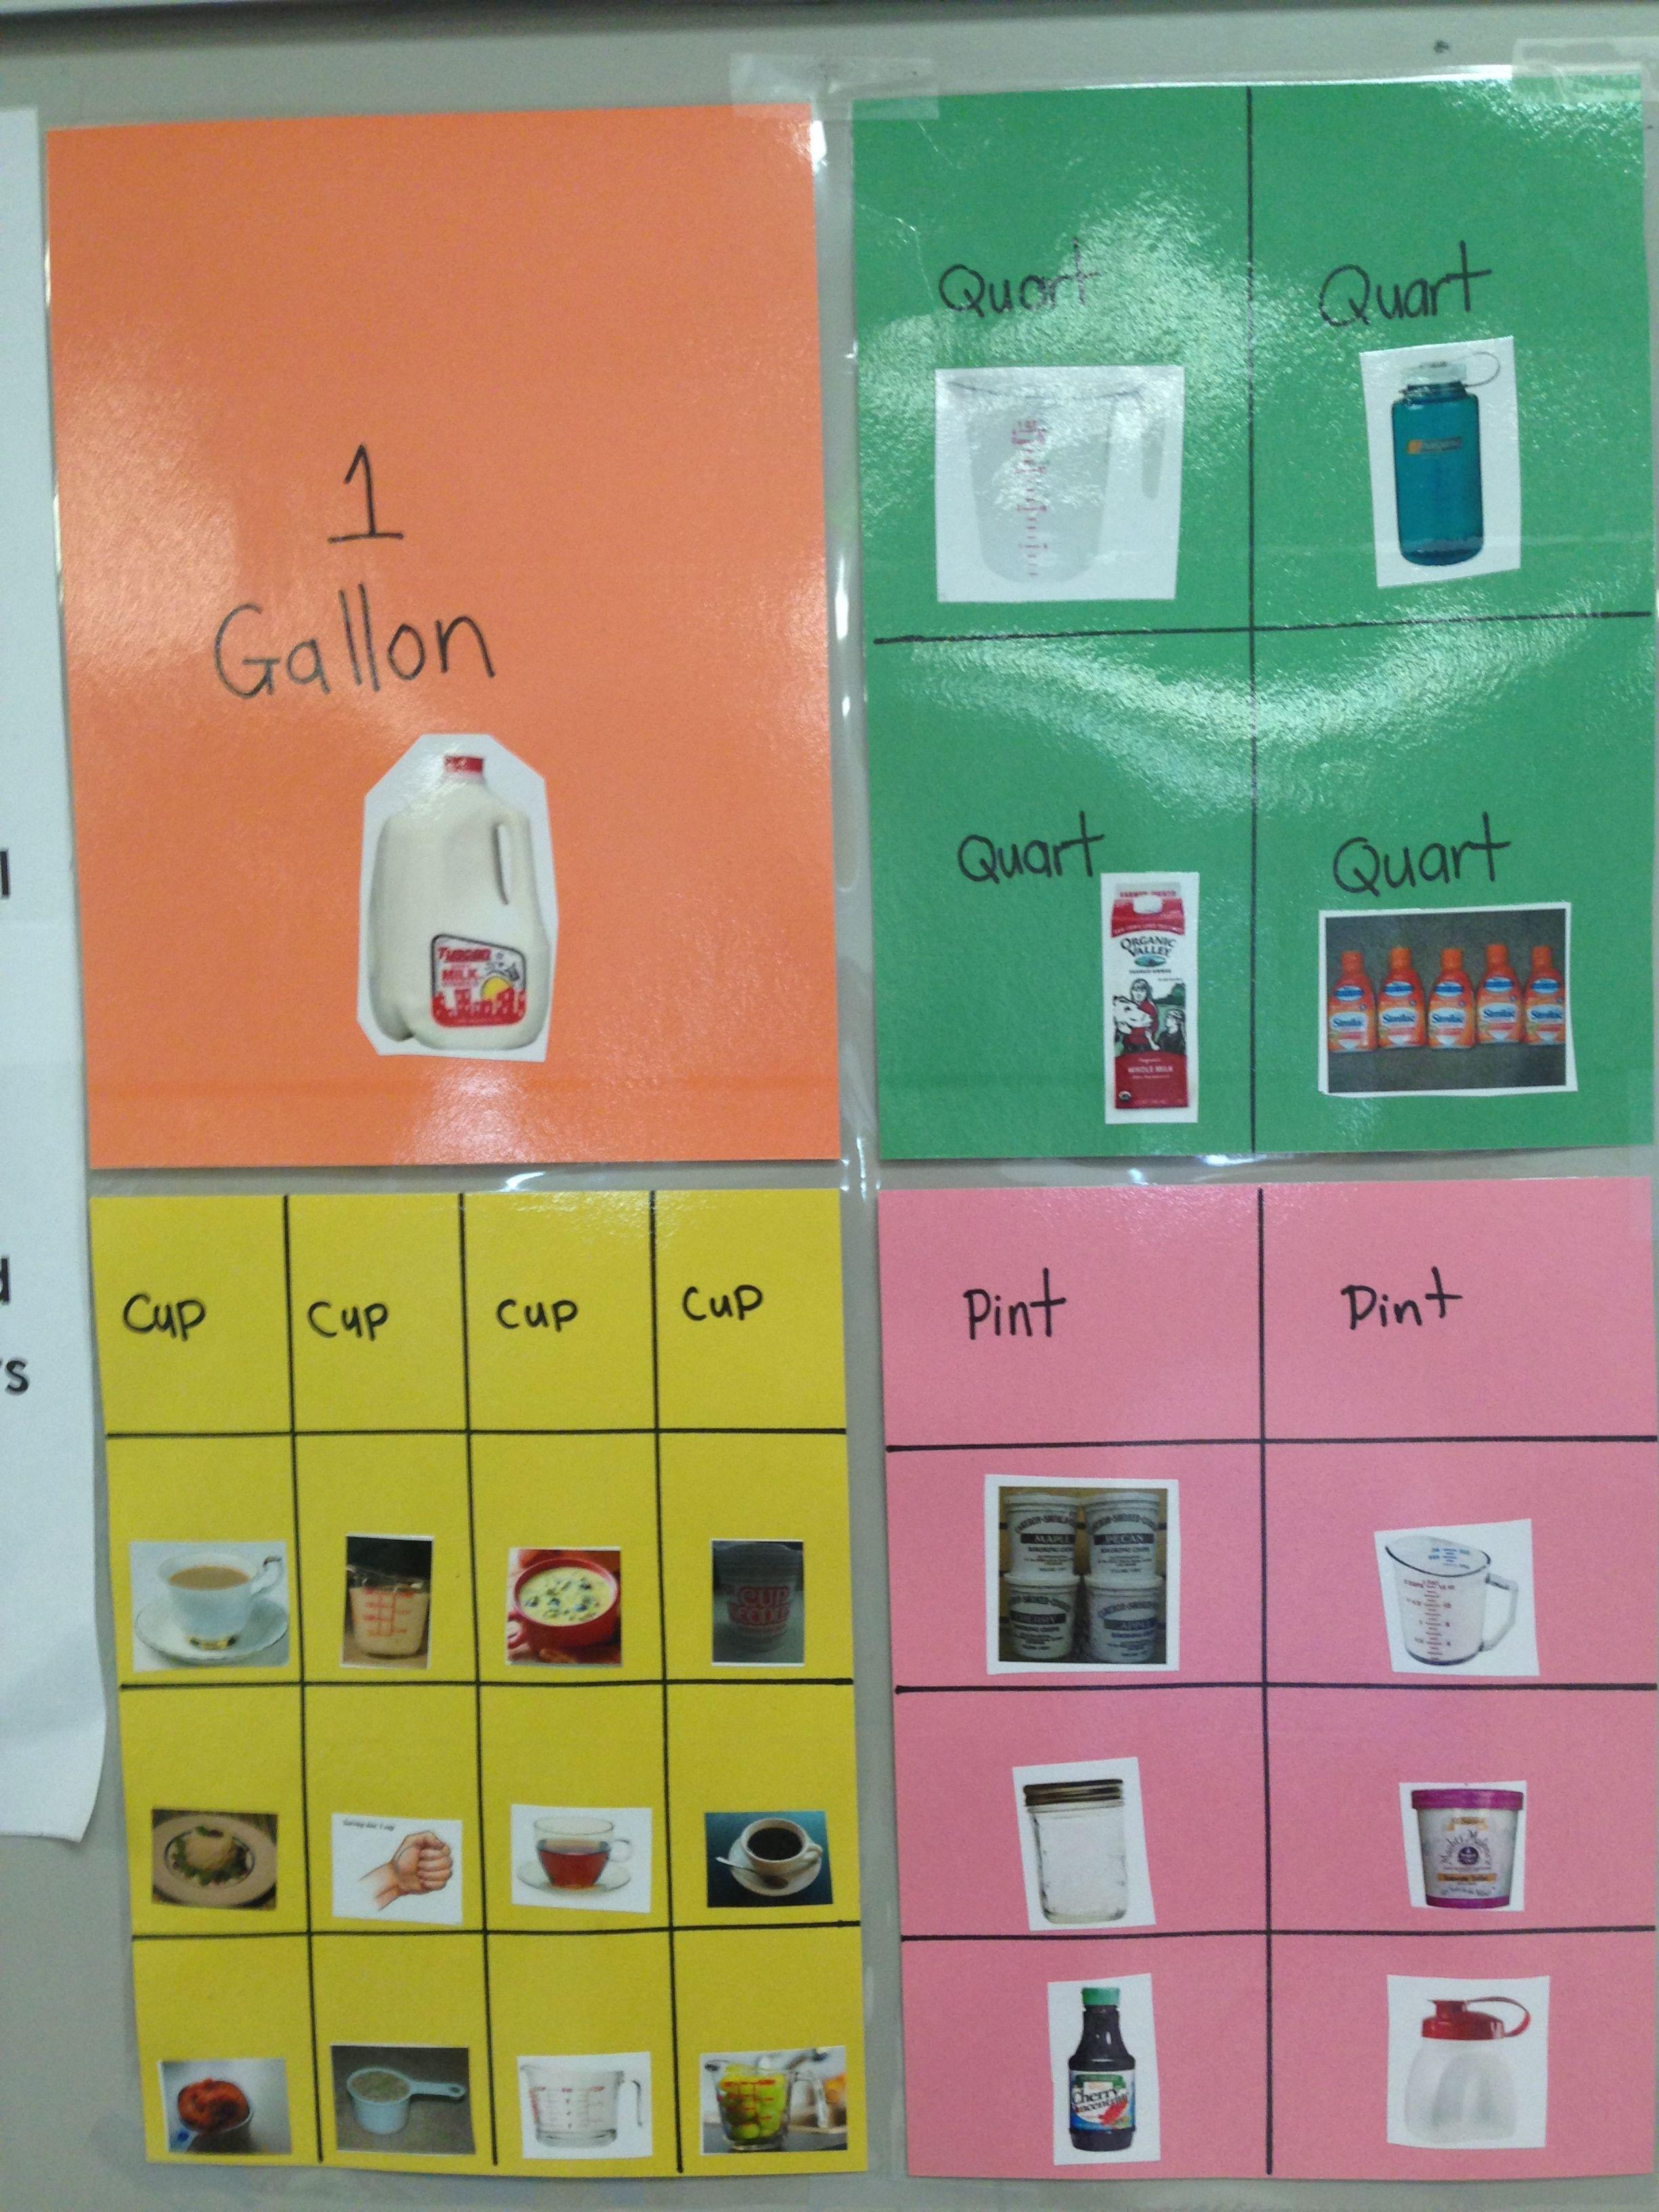 Capacity Gallon Quart Pint Amp Cup